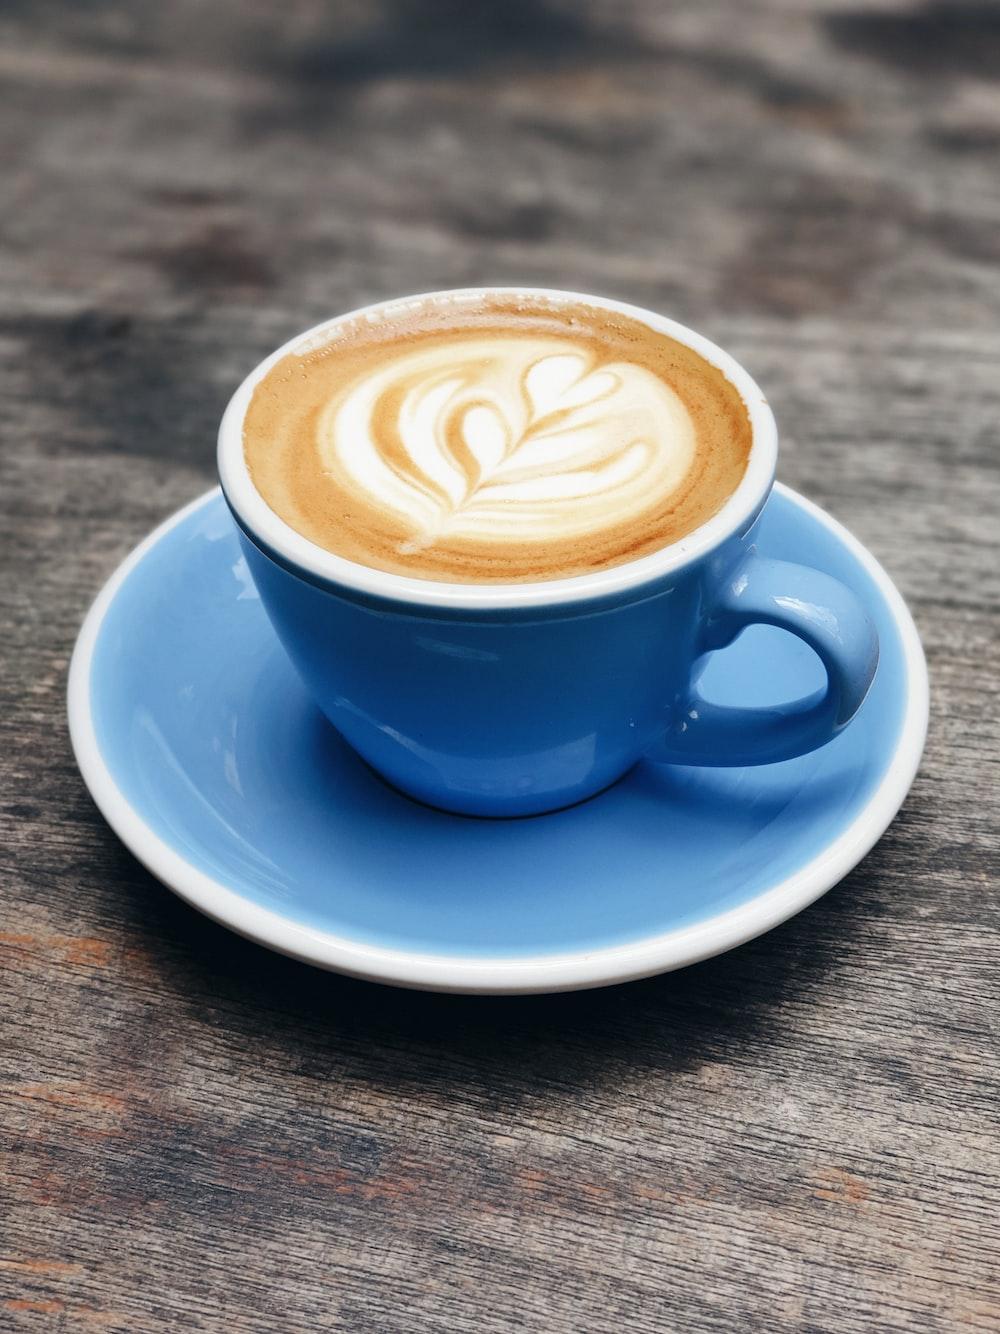 blue ceramic teacup with latte